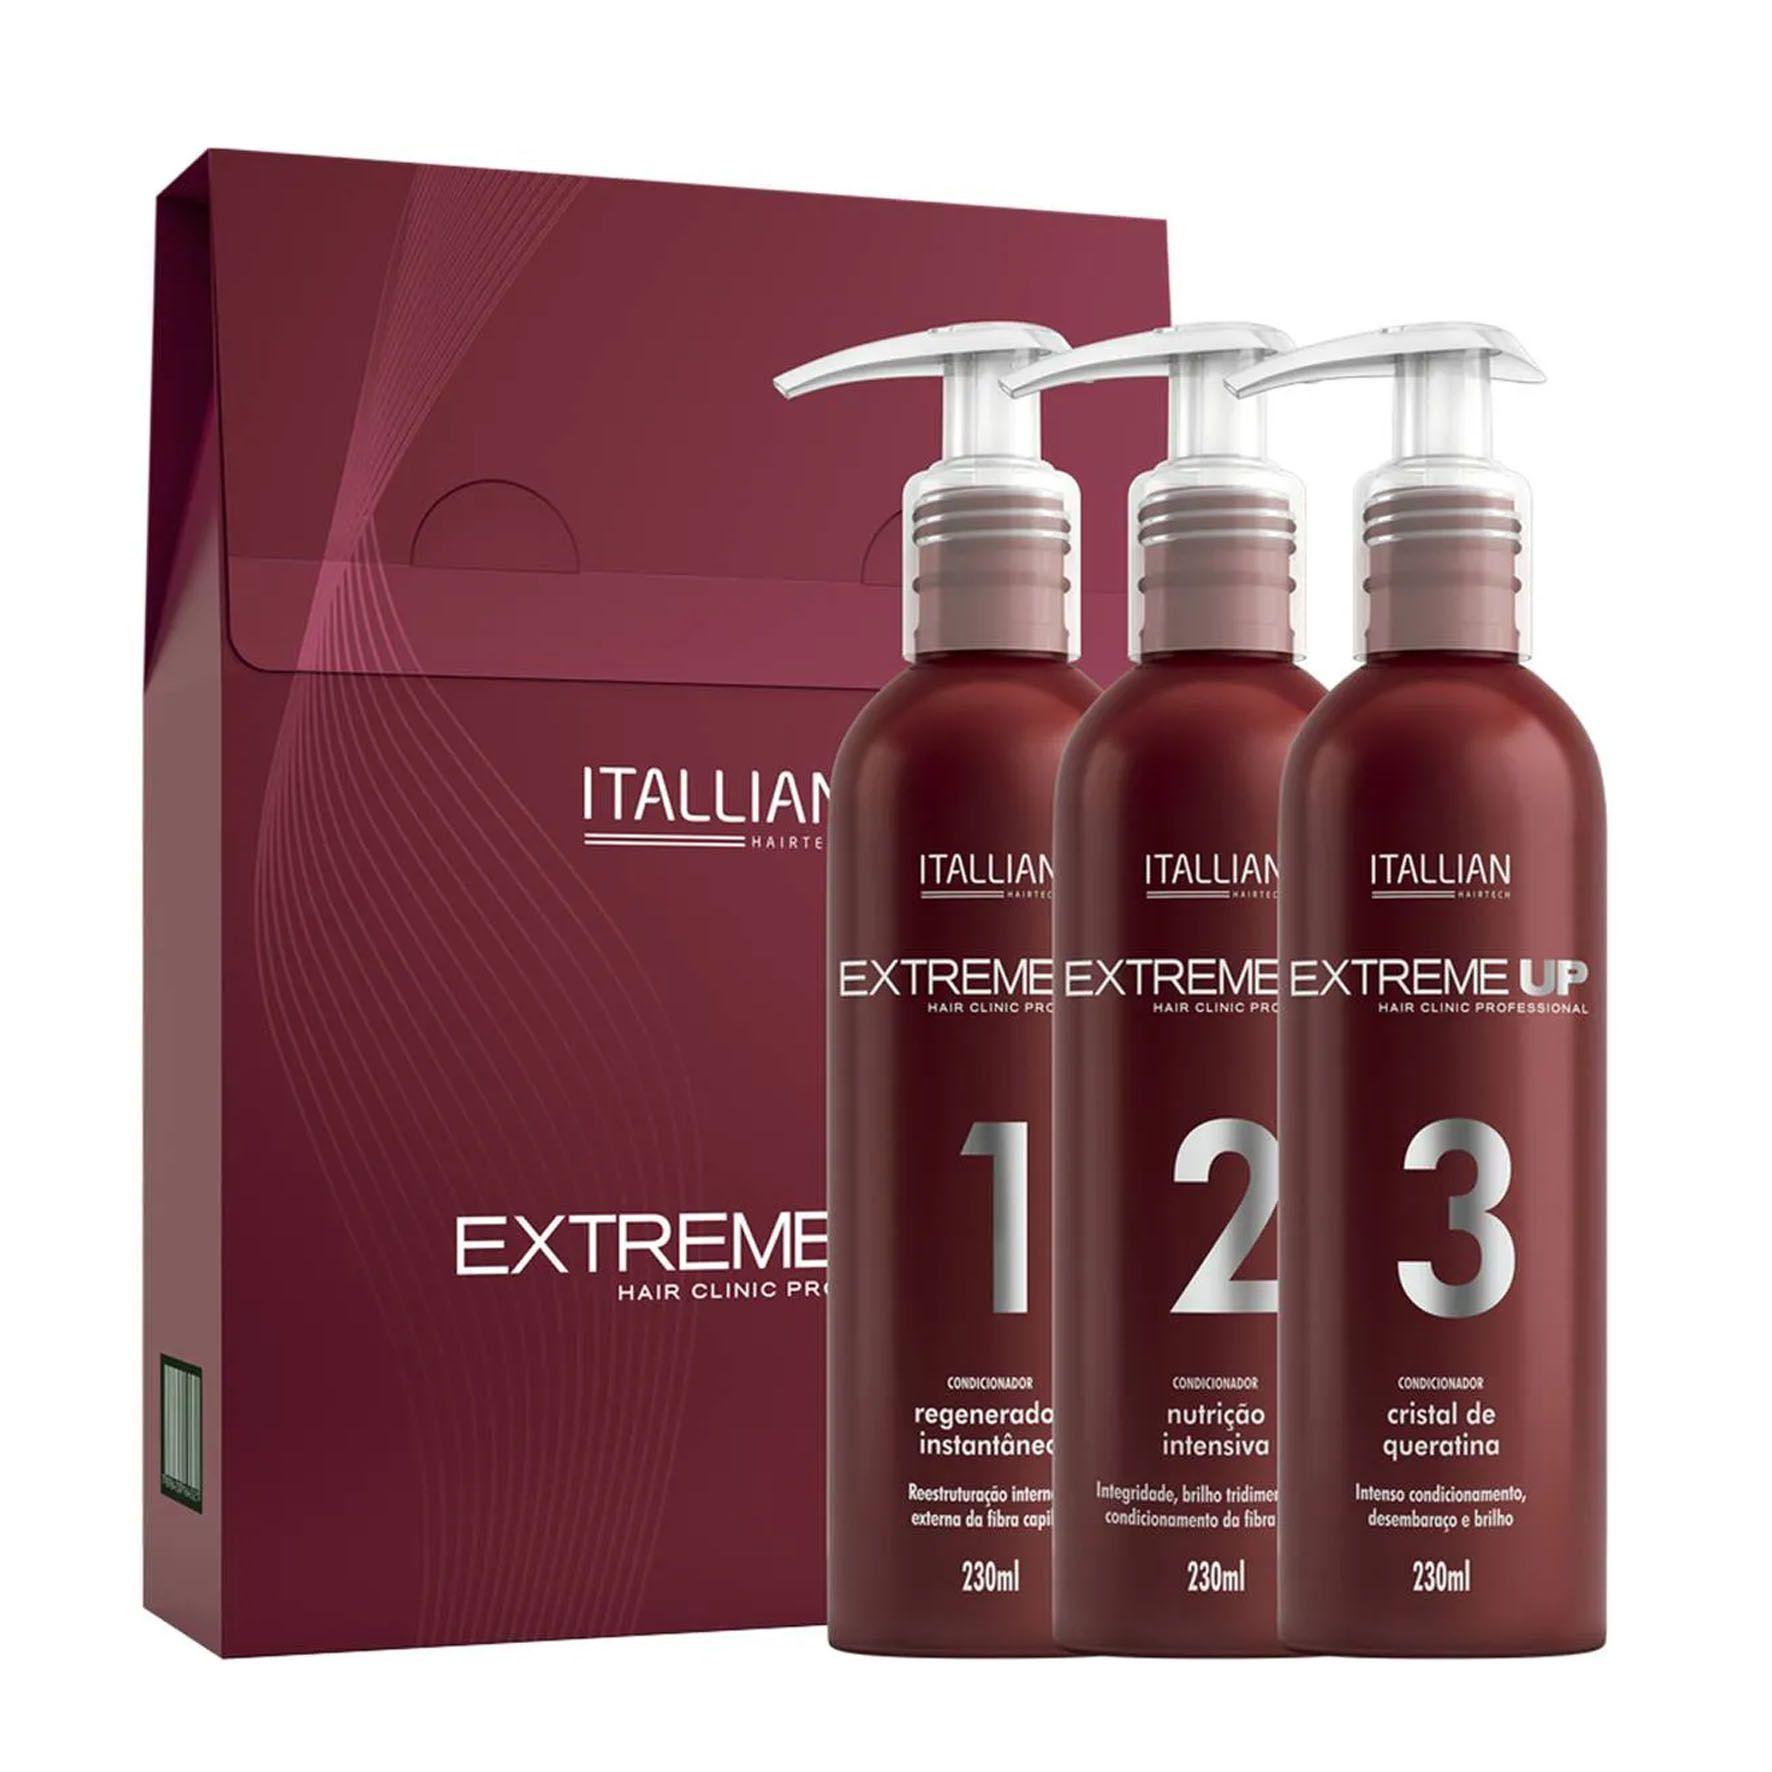 Itallian Kit Extreme Up Hair